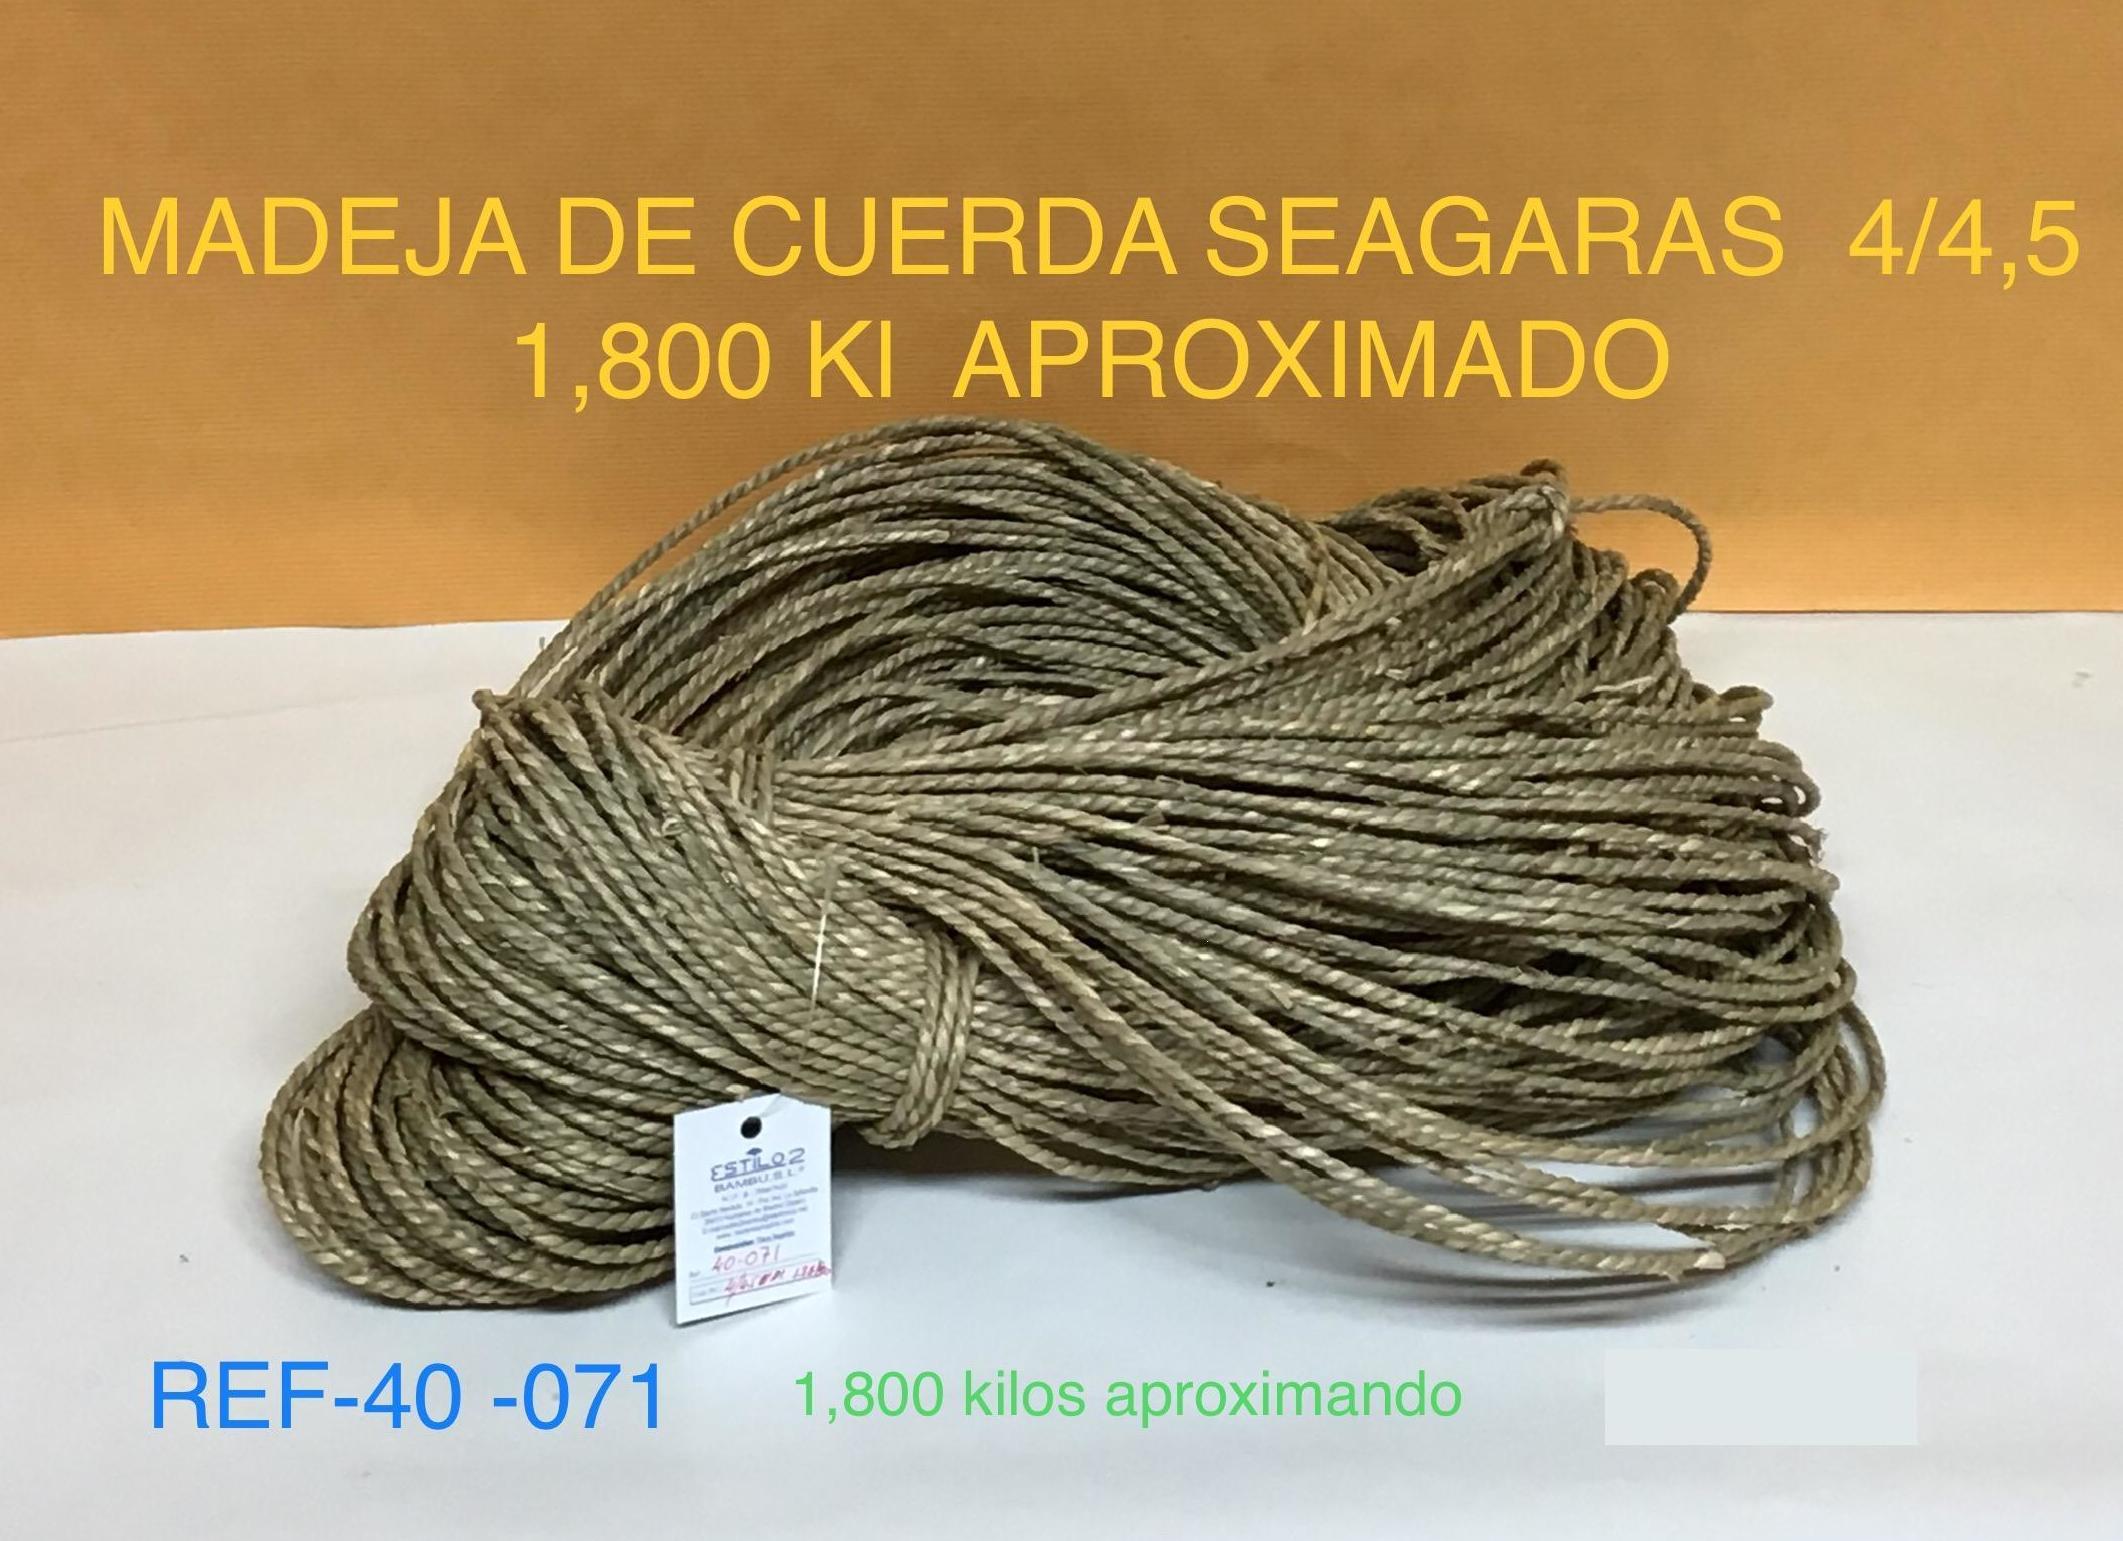 SEAGRAS MADEJA  1,800 APROX 4/4,5 MM